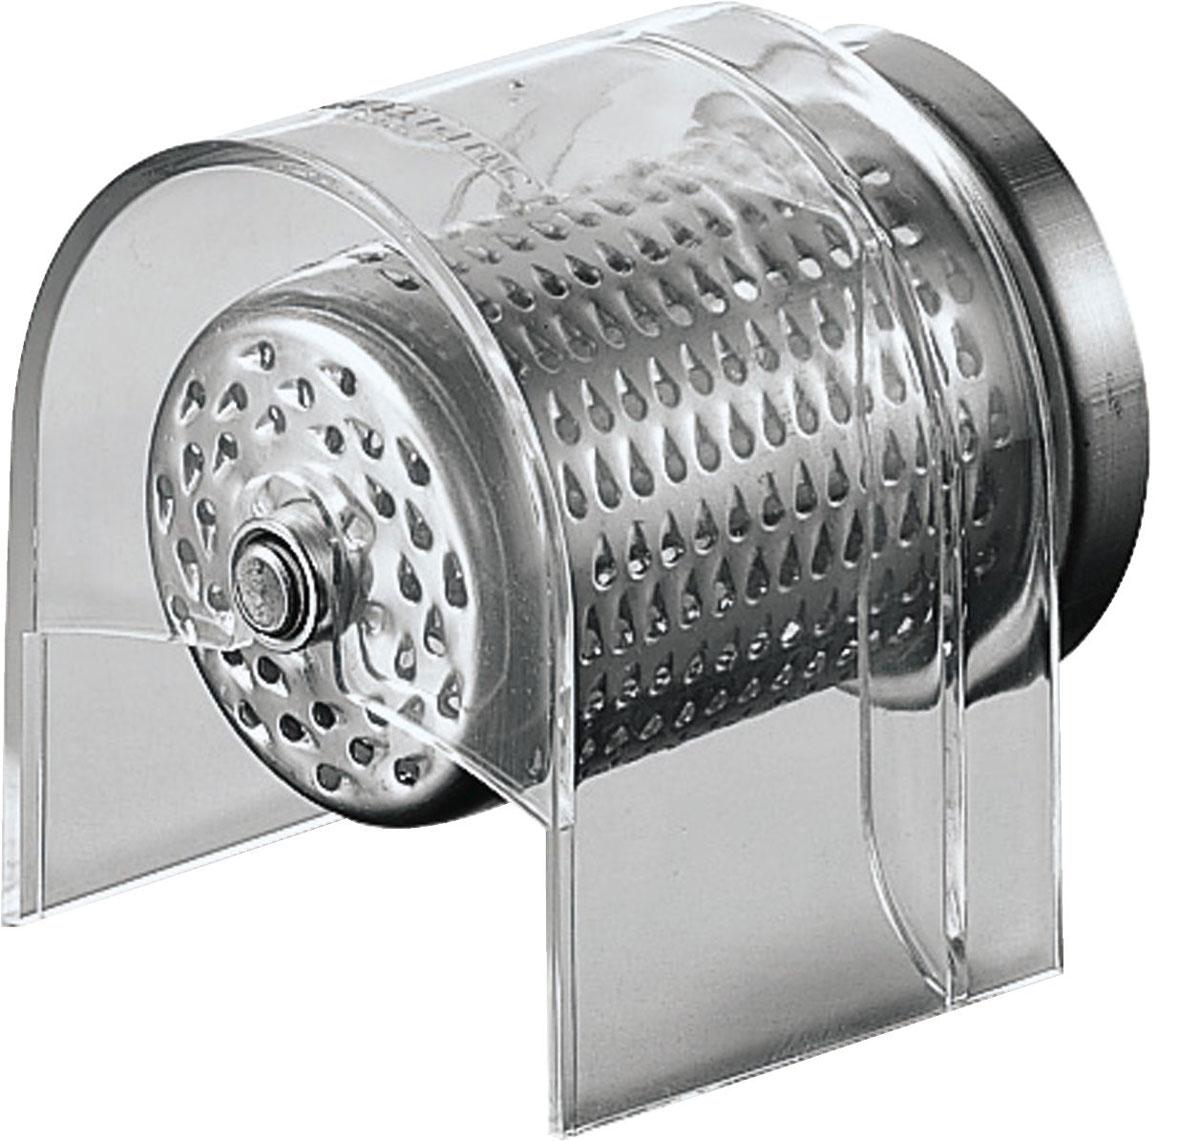 Bosch MUZ45RV1 диск-терка для кухонных комбайнов терка для сыра leifheit comfortline